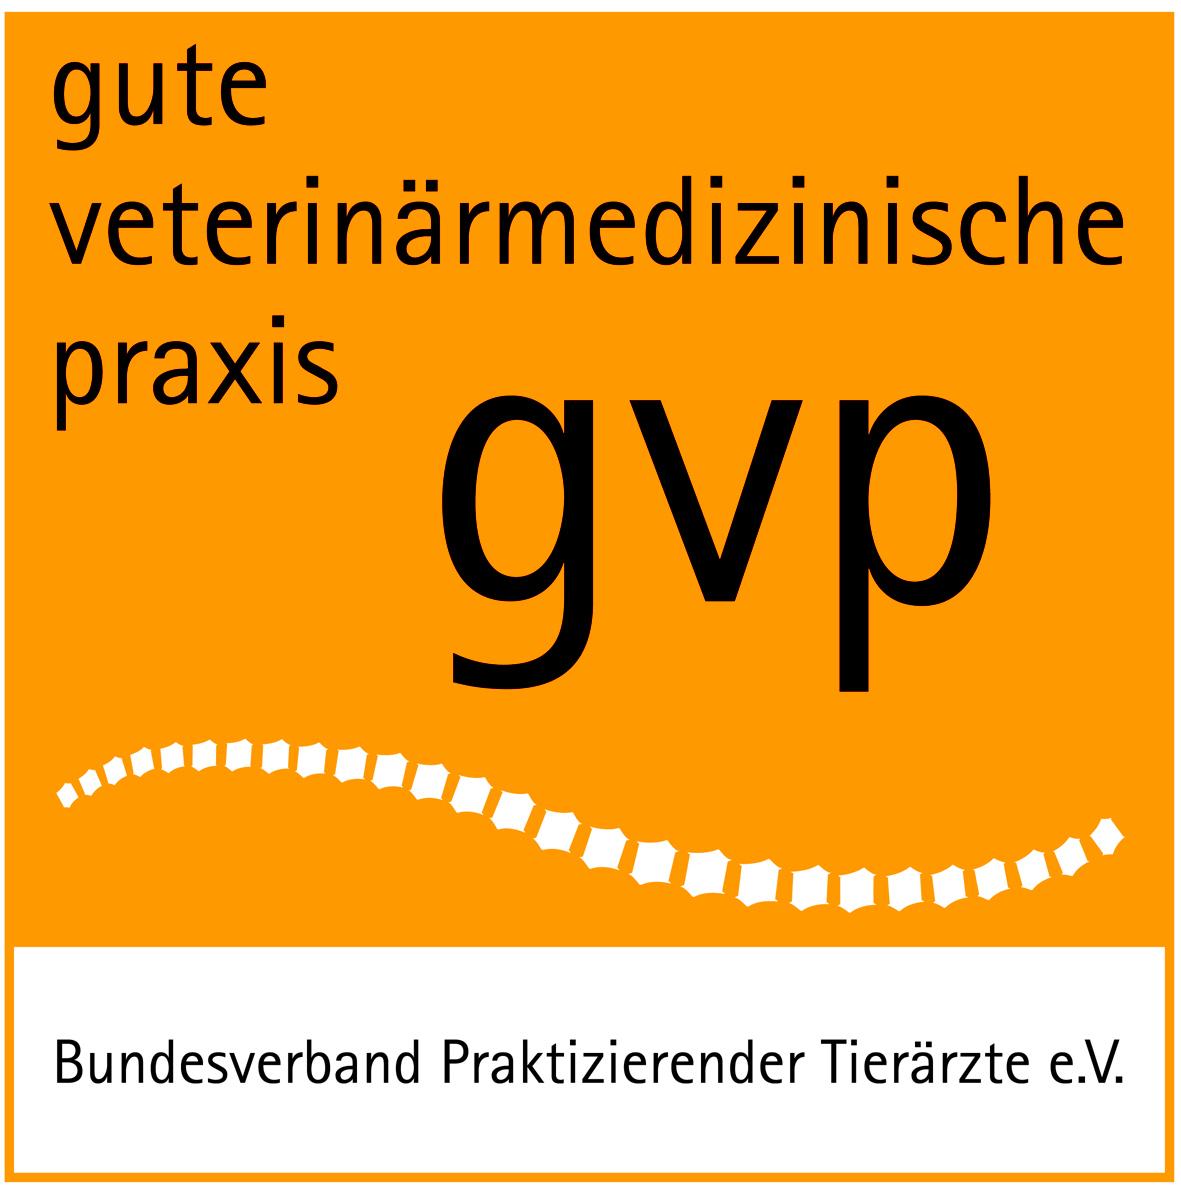 GVP_4C_M